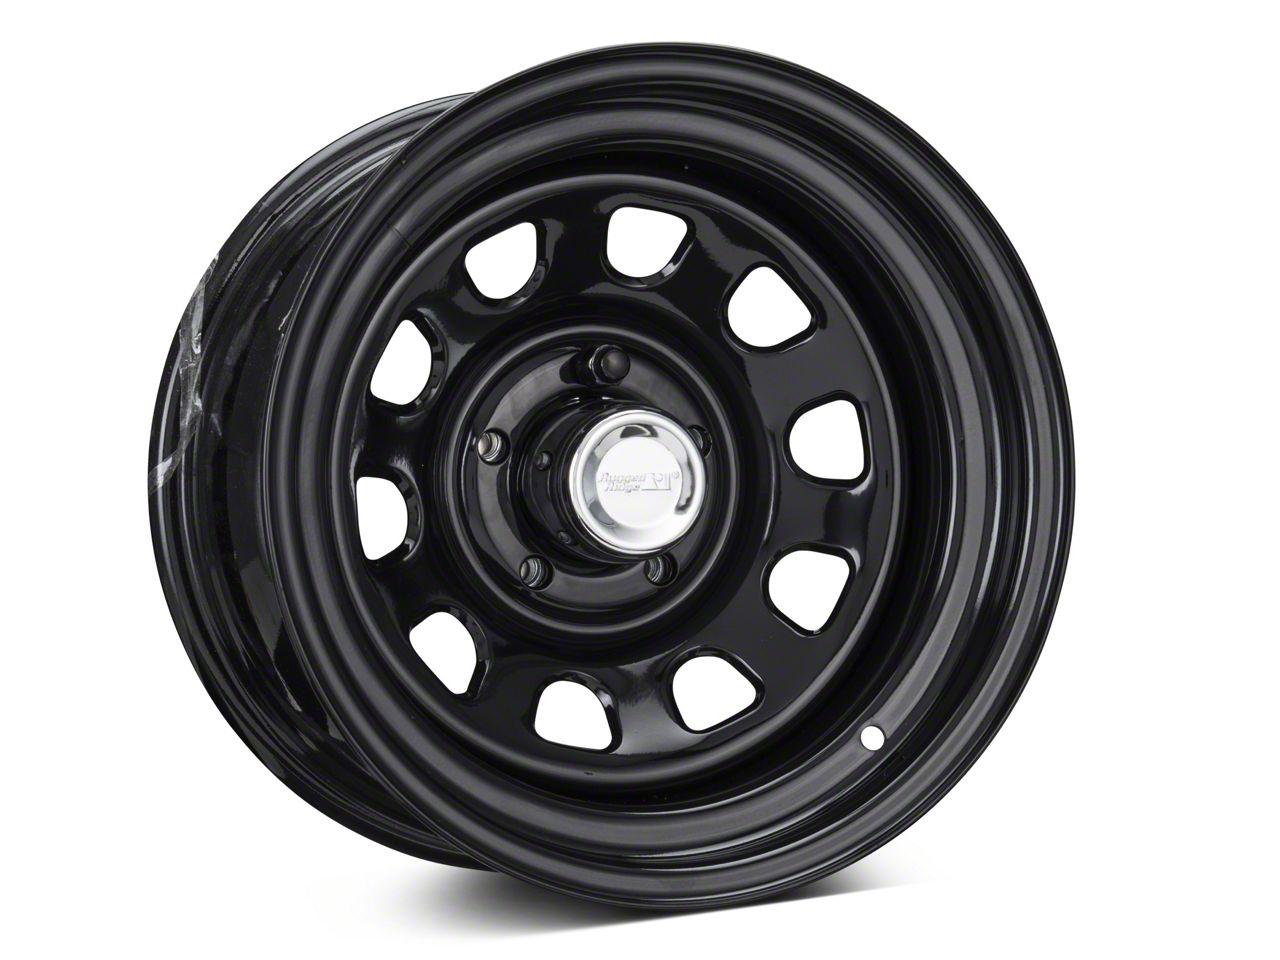 Rugged Ridge D-Window Black Steel Wheel 15x8 Wheel & Mickey Thompson Deegan 38 31x10.50R15 Tire Kit (87-06 Jeep Wrangler YJ & TJ)